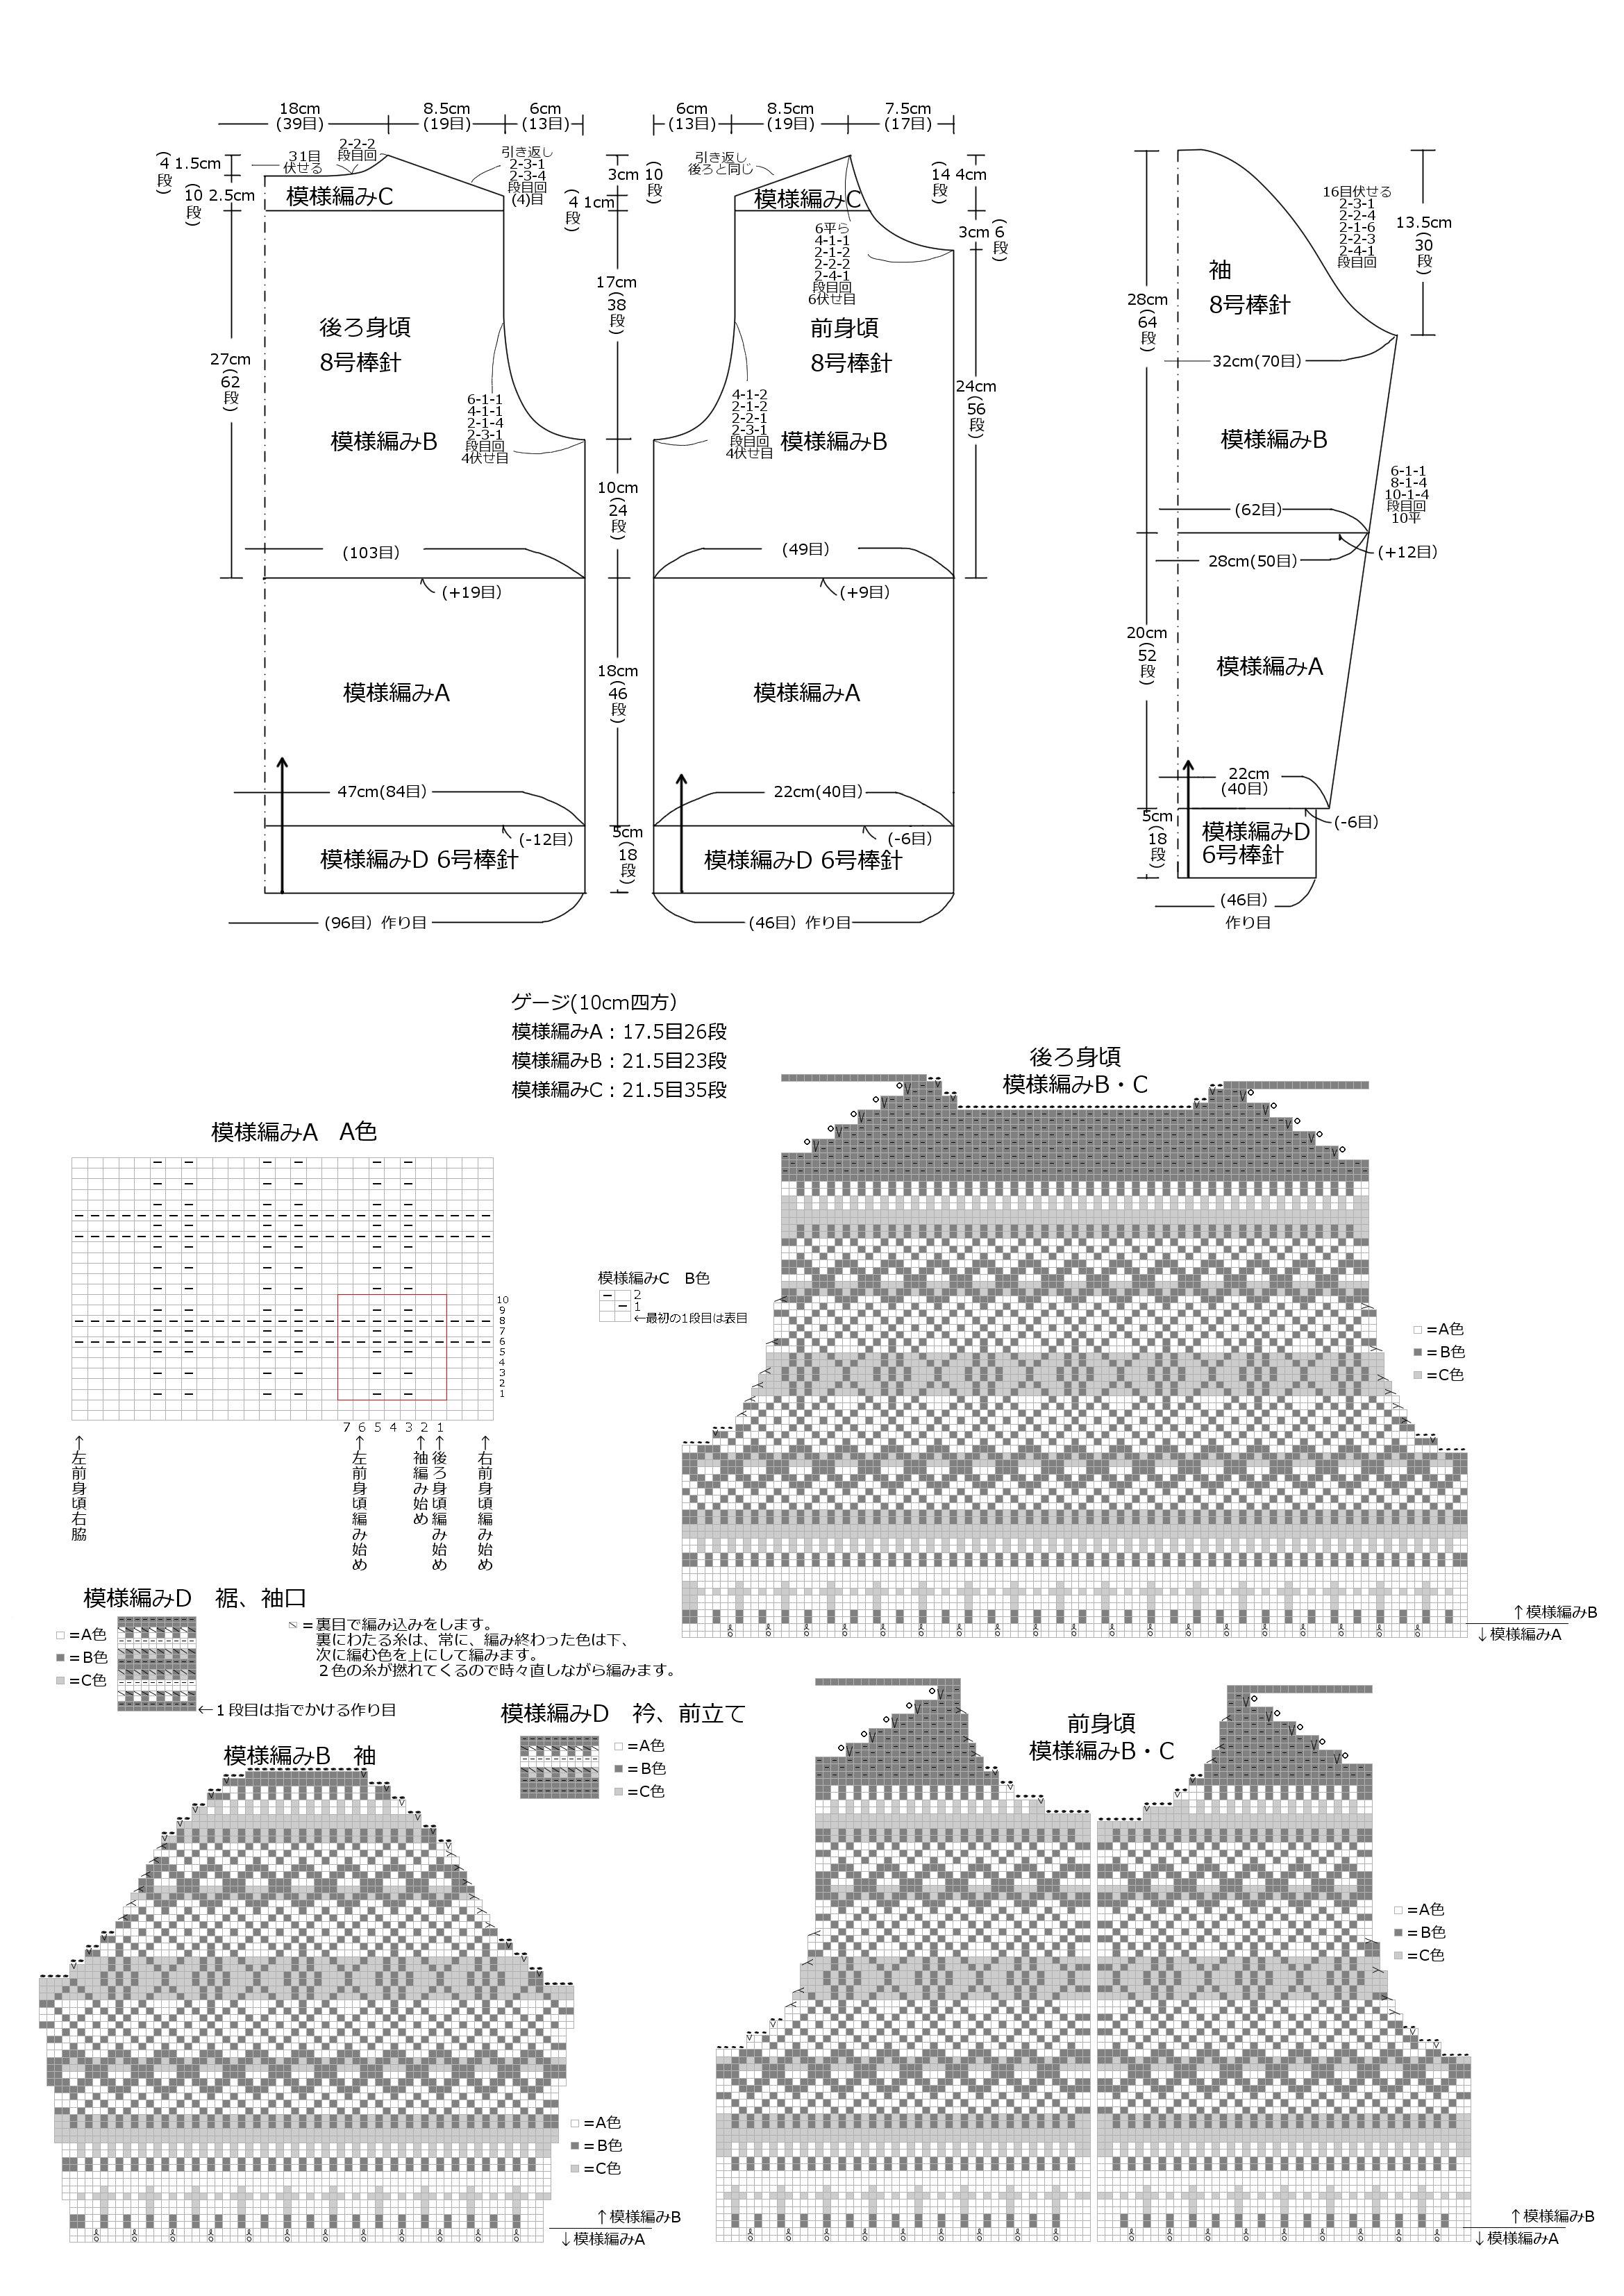 tricoカーデ製図(1)